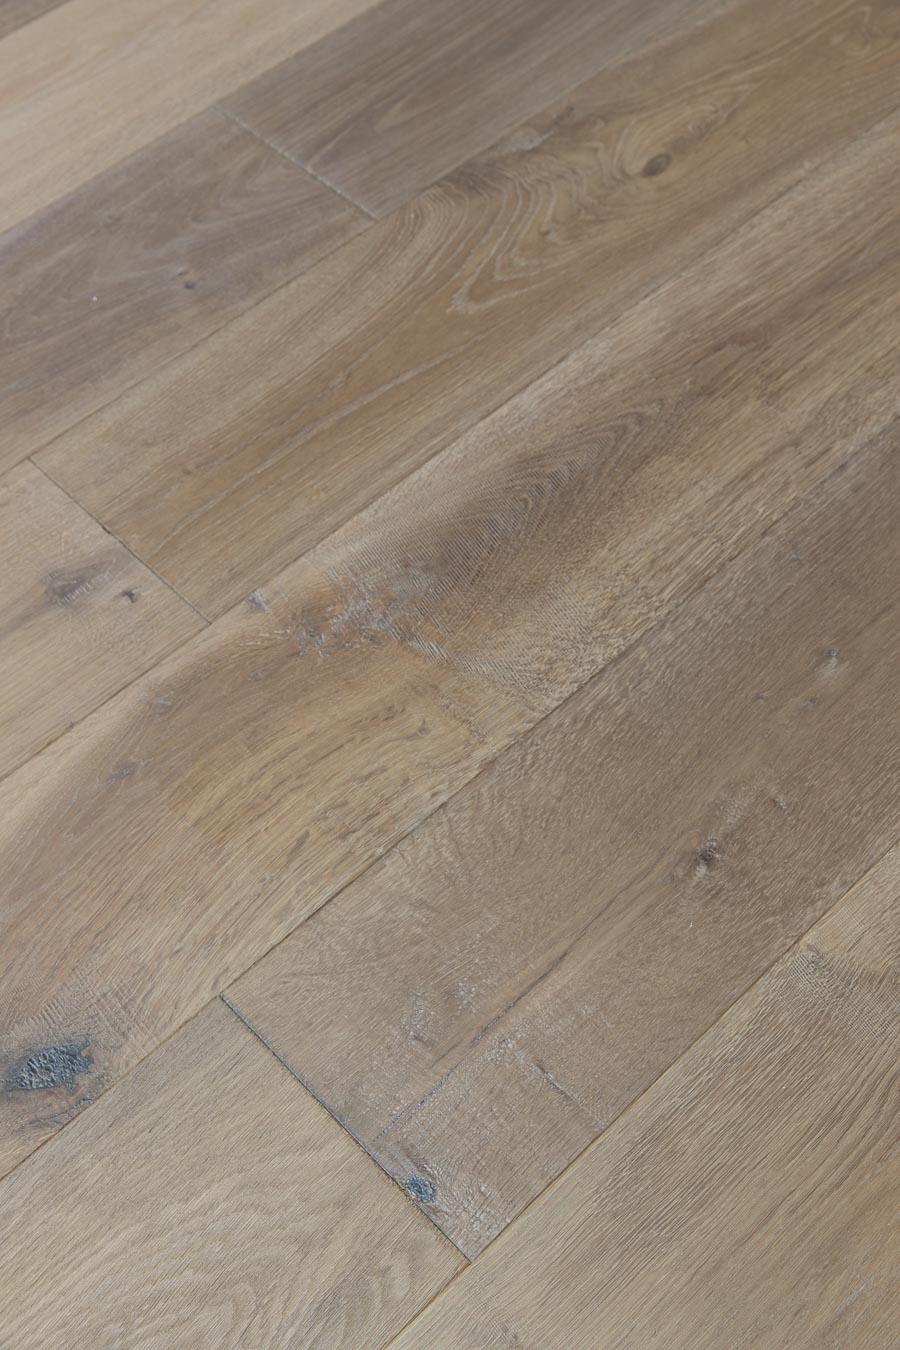 Hallmark Floor's Alta Vista flooring in Malibu - gorgeous!